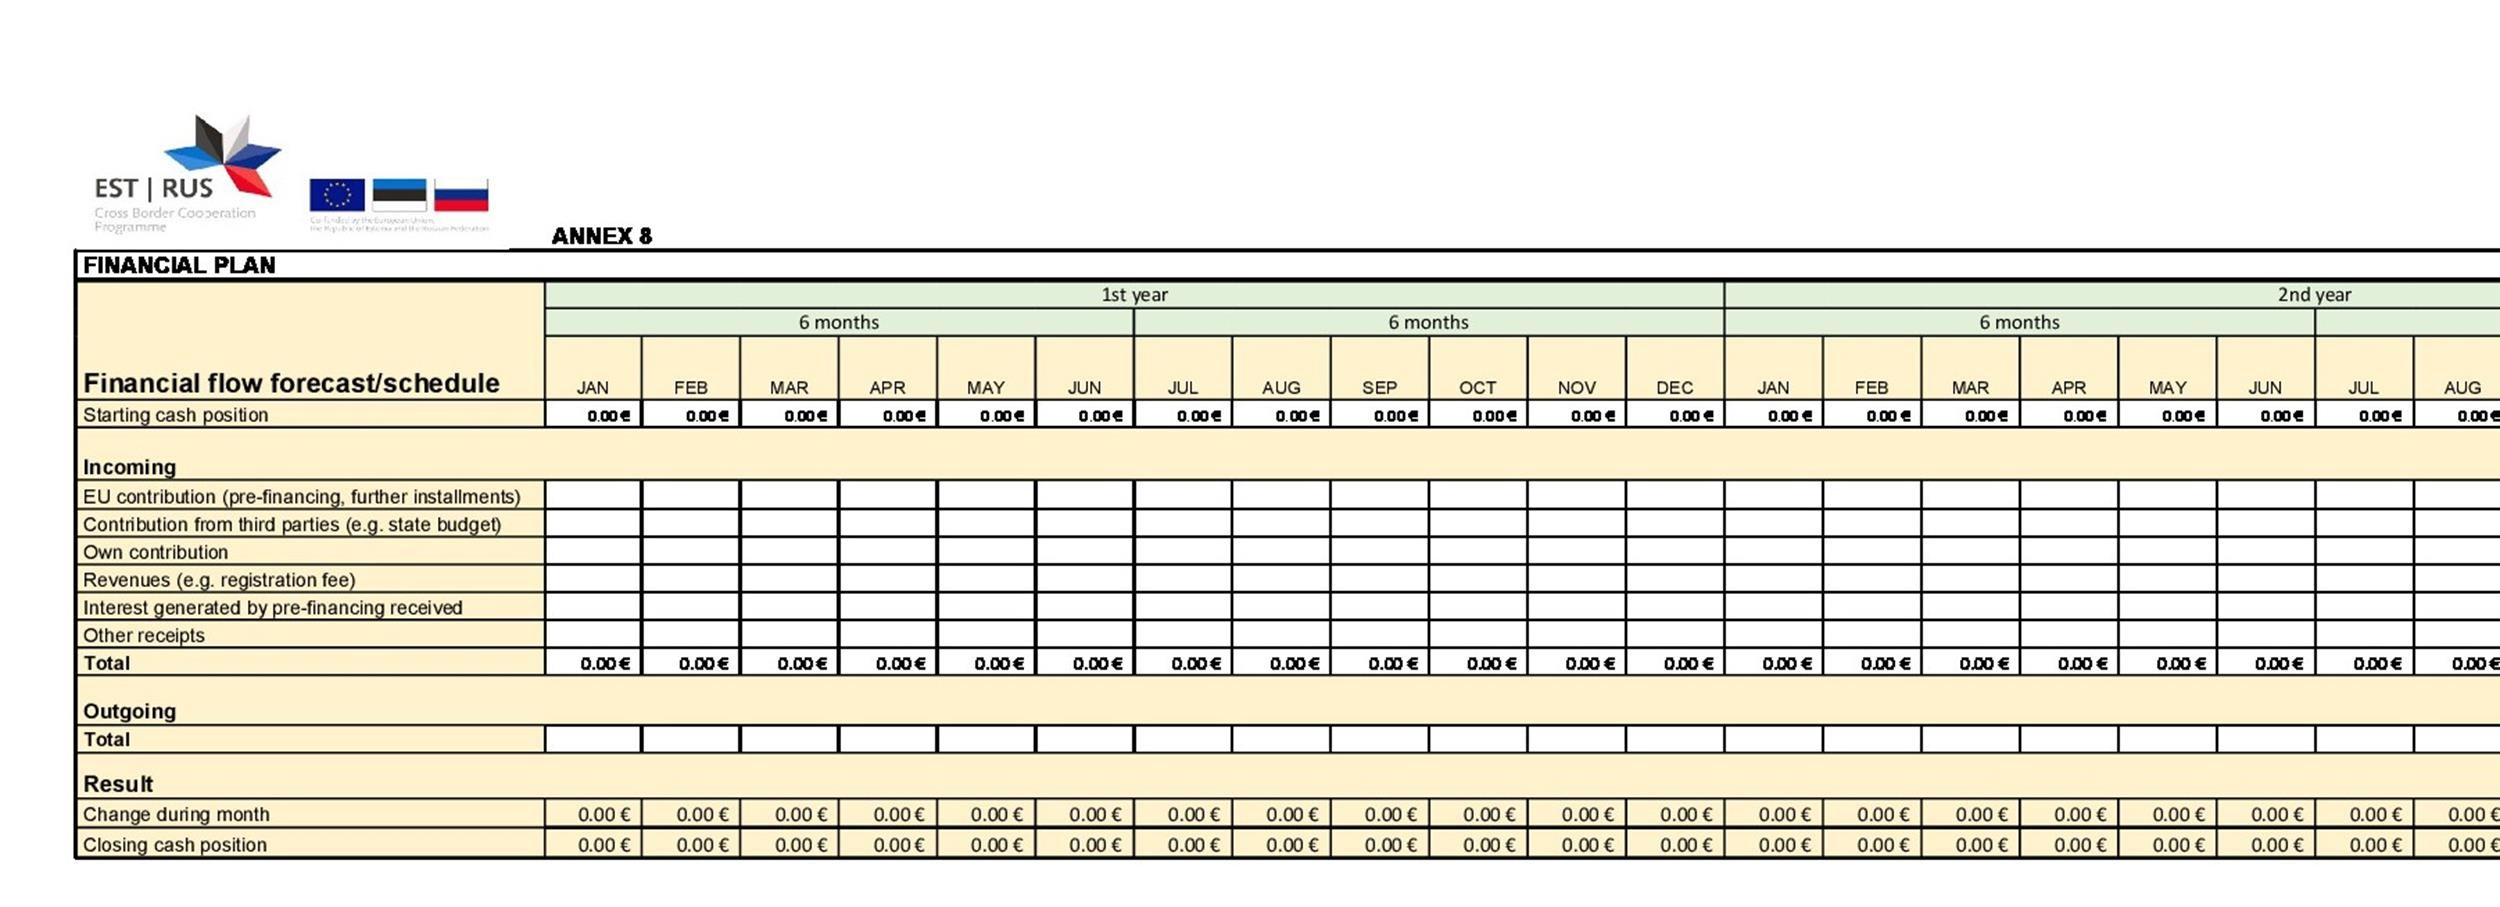 Free financial plan template 23